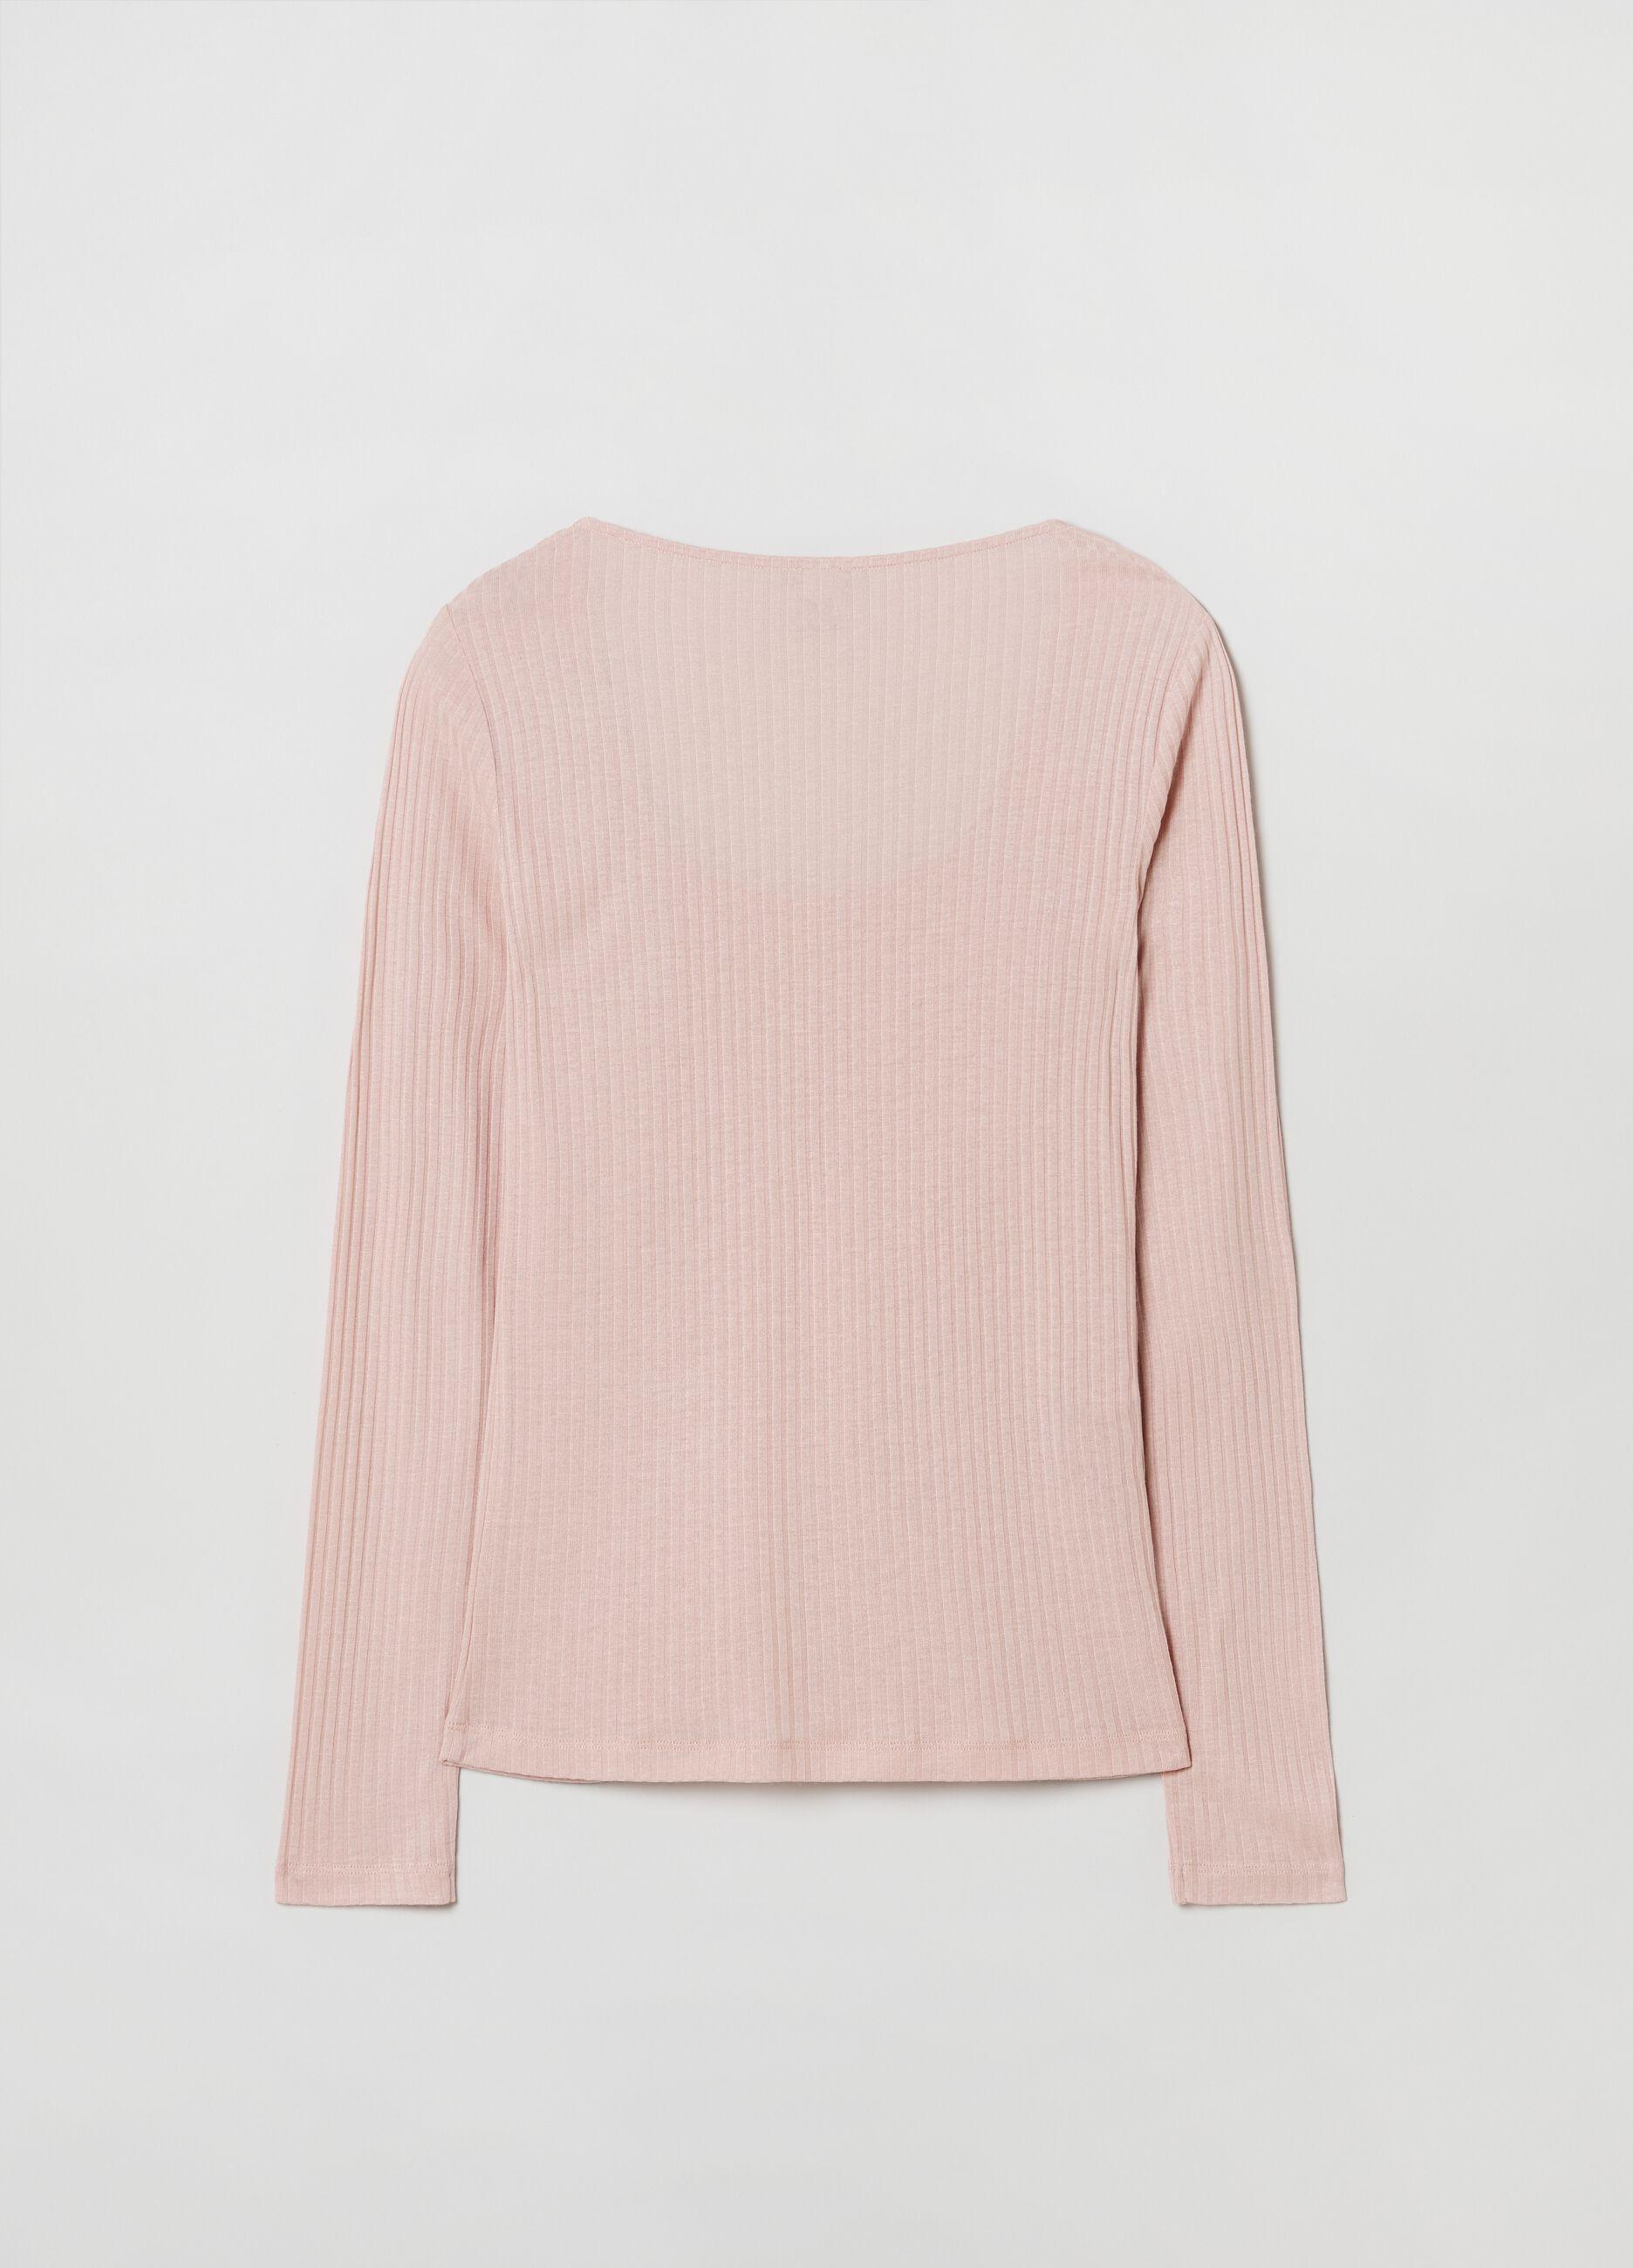 T-shirt in modal a costina larga Rosa